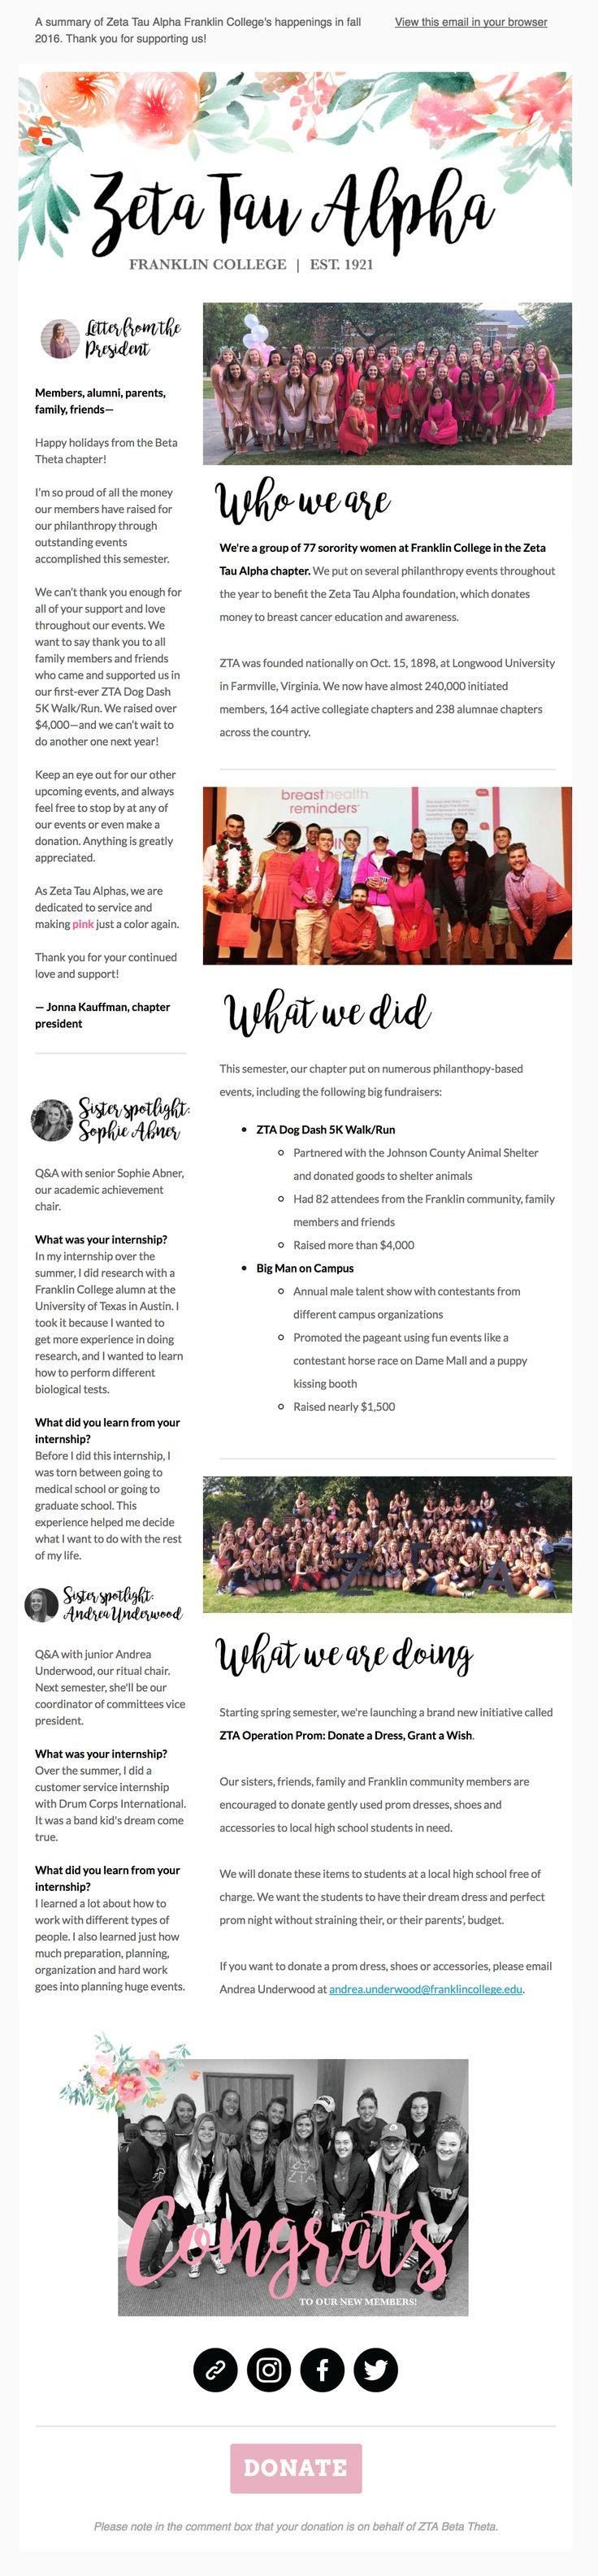 End-of-the-semester summary newsletter design for the Zeta Tau Alpha sorority, Beta Theta chapter at Franklin College in Franklin, Indiana. #zta #zetataualpha #newsletter #prettynewsletter #newsletterdesign #design #mailchimp #flowers #emailnewsletter #sororitynewsletter #sorority #zeta #recruitment #parentnewsletter #cutenewsletter #pink #breastcancer #bmoc #dogdash #fundraising #sororitygirls #breastcancer #foundation #donation #donate #ztafoundation #womenshealth #philanthropy